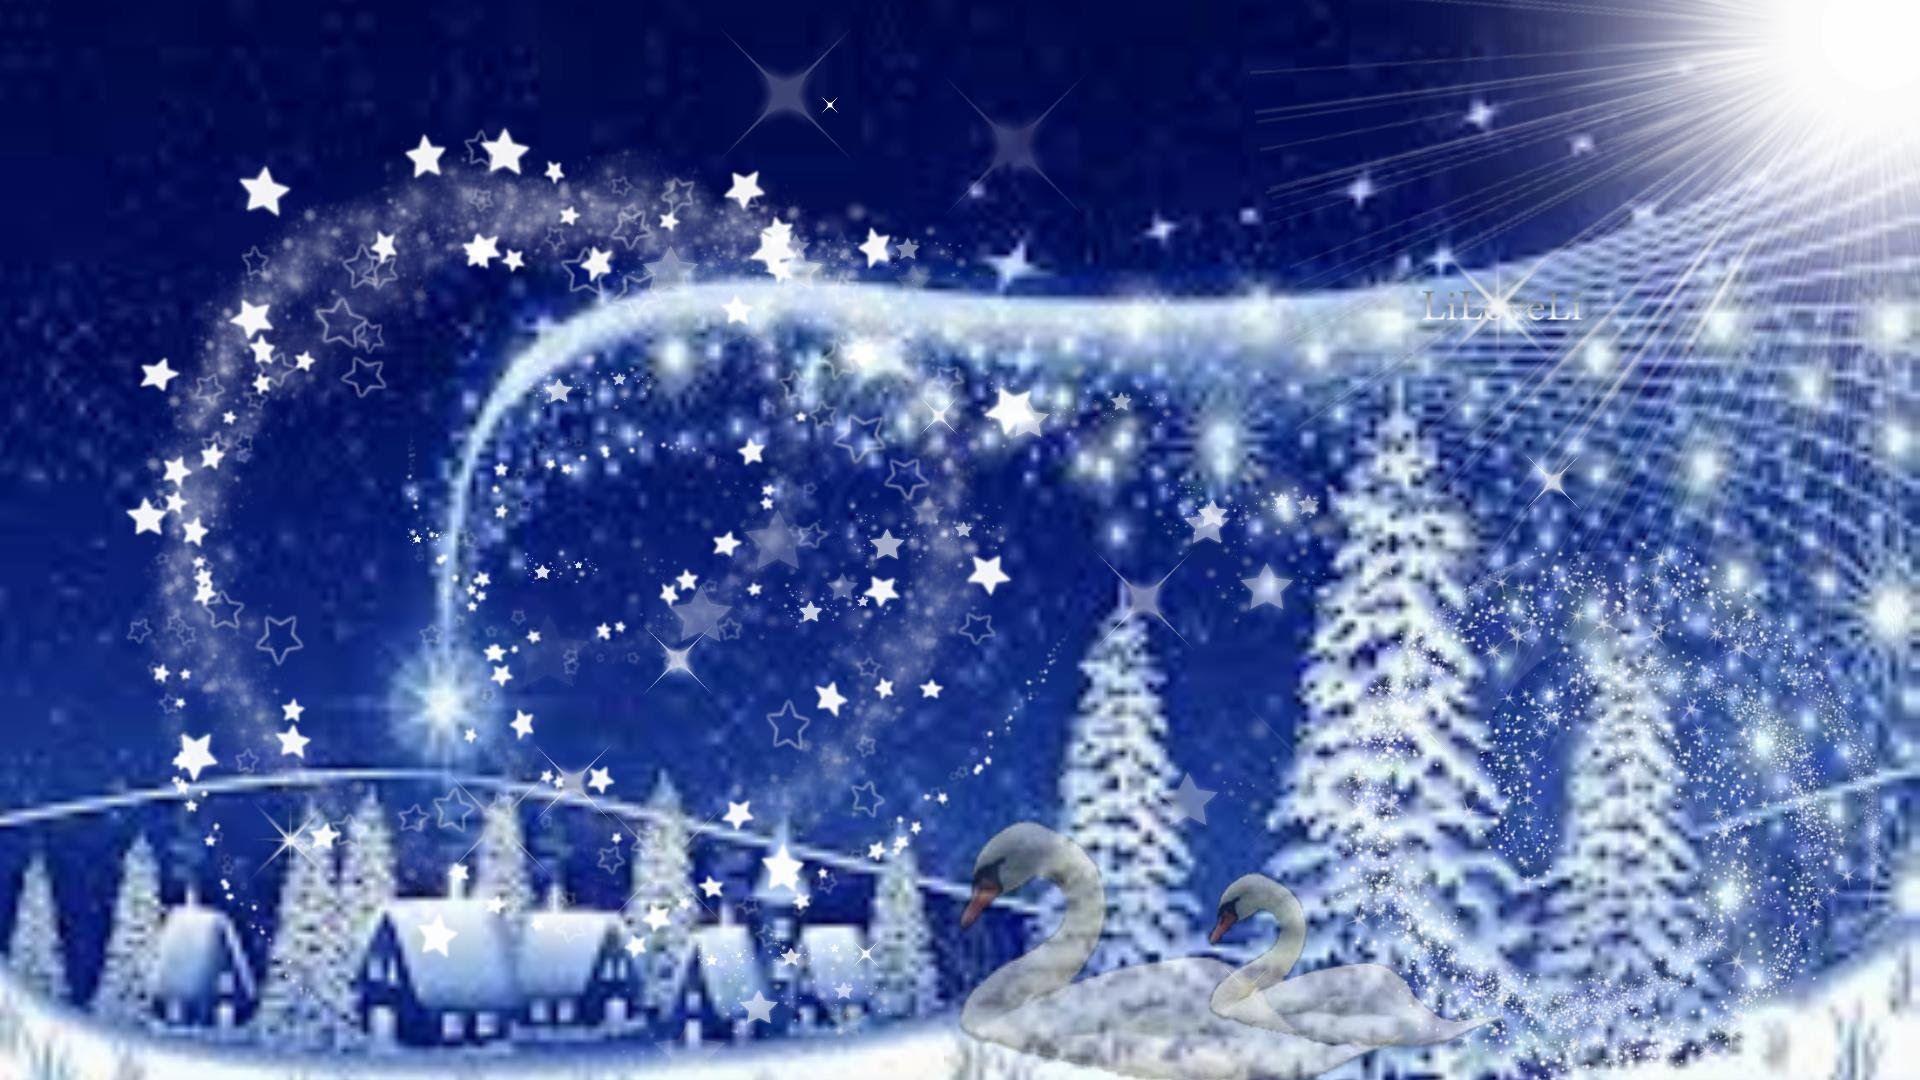 ♥ I Wish You A Merry Christmas♥